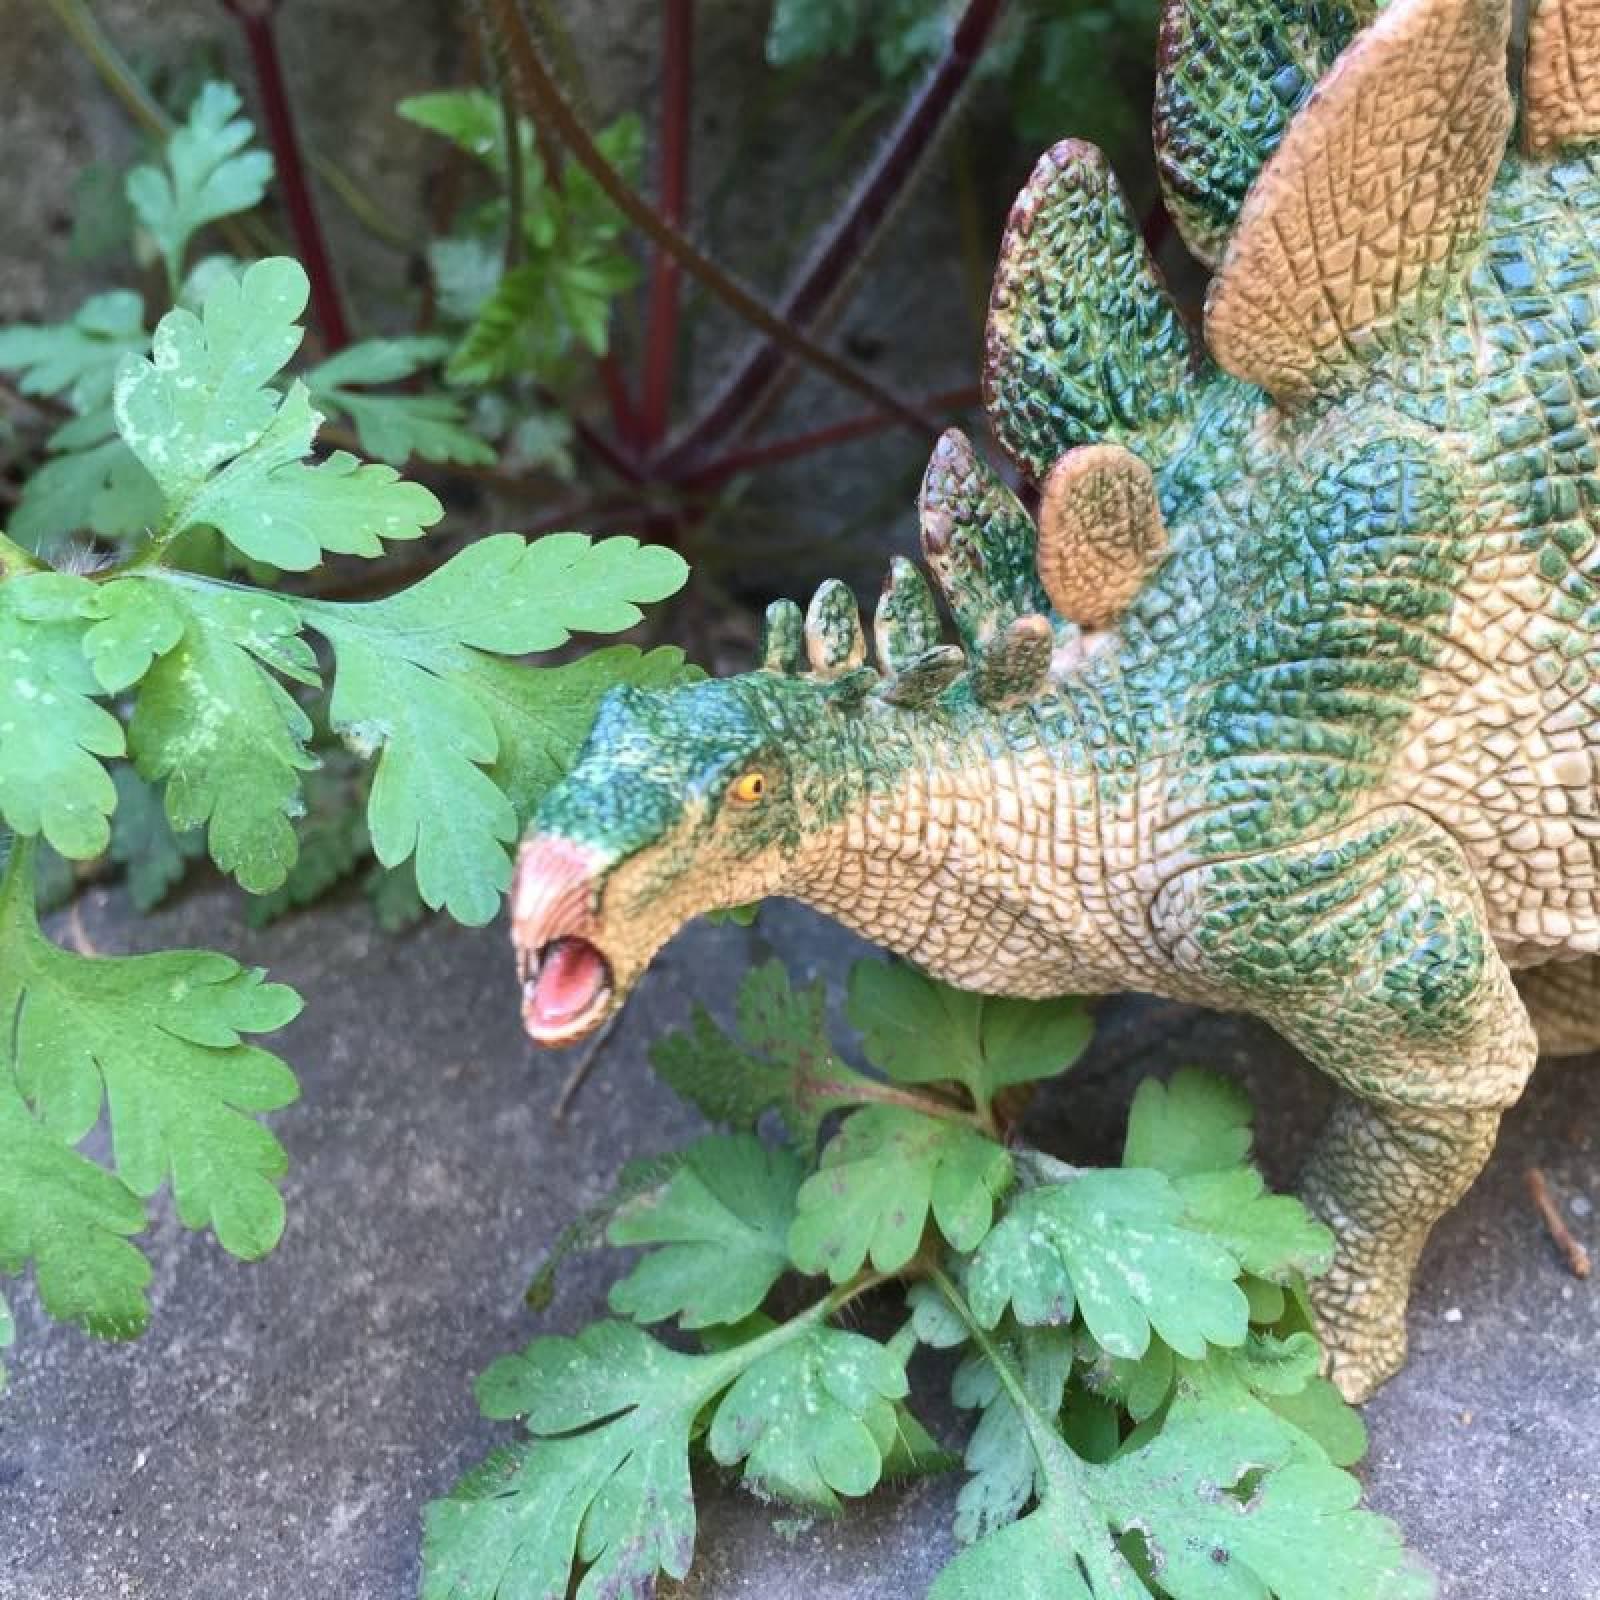 STEGOSAURUS Papo Dinosaur thumbnails